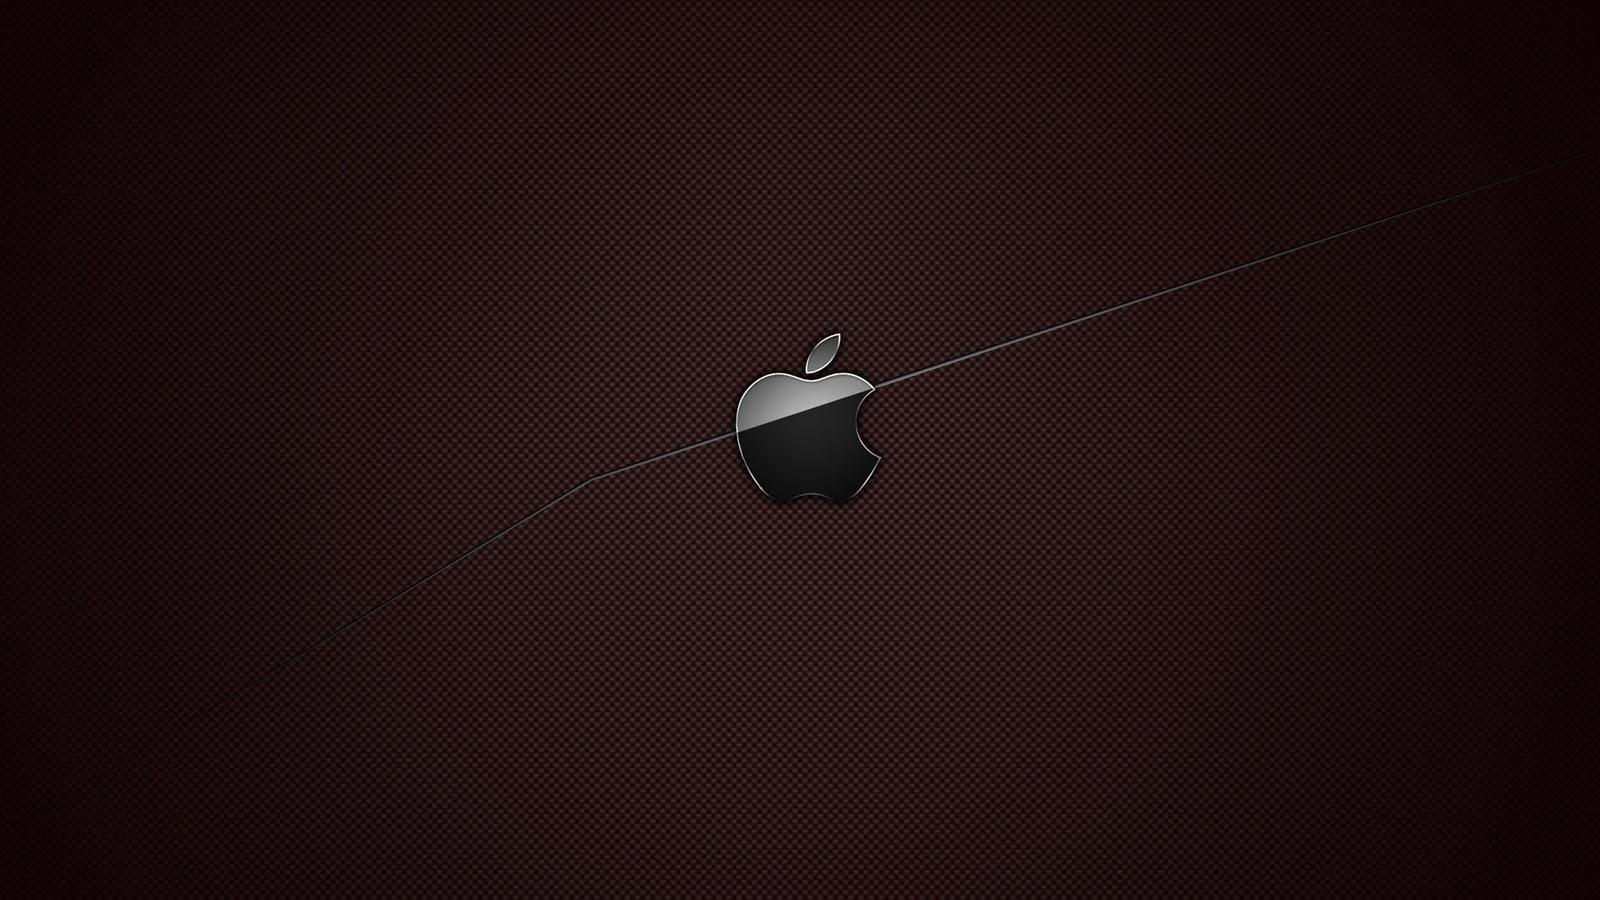 Animated Desktop Background 1600x900